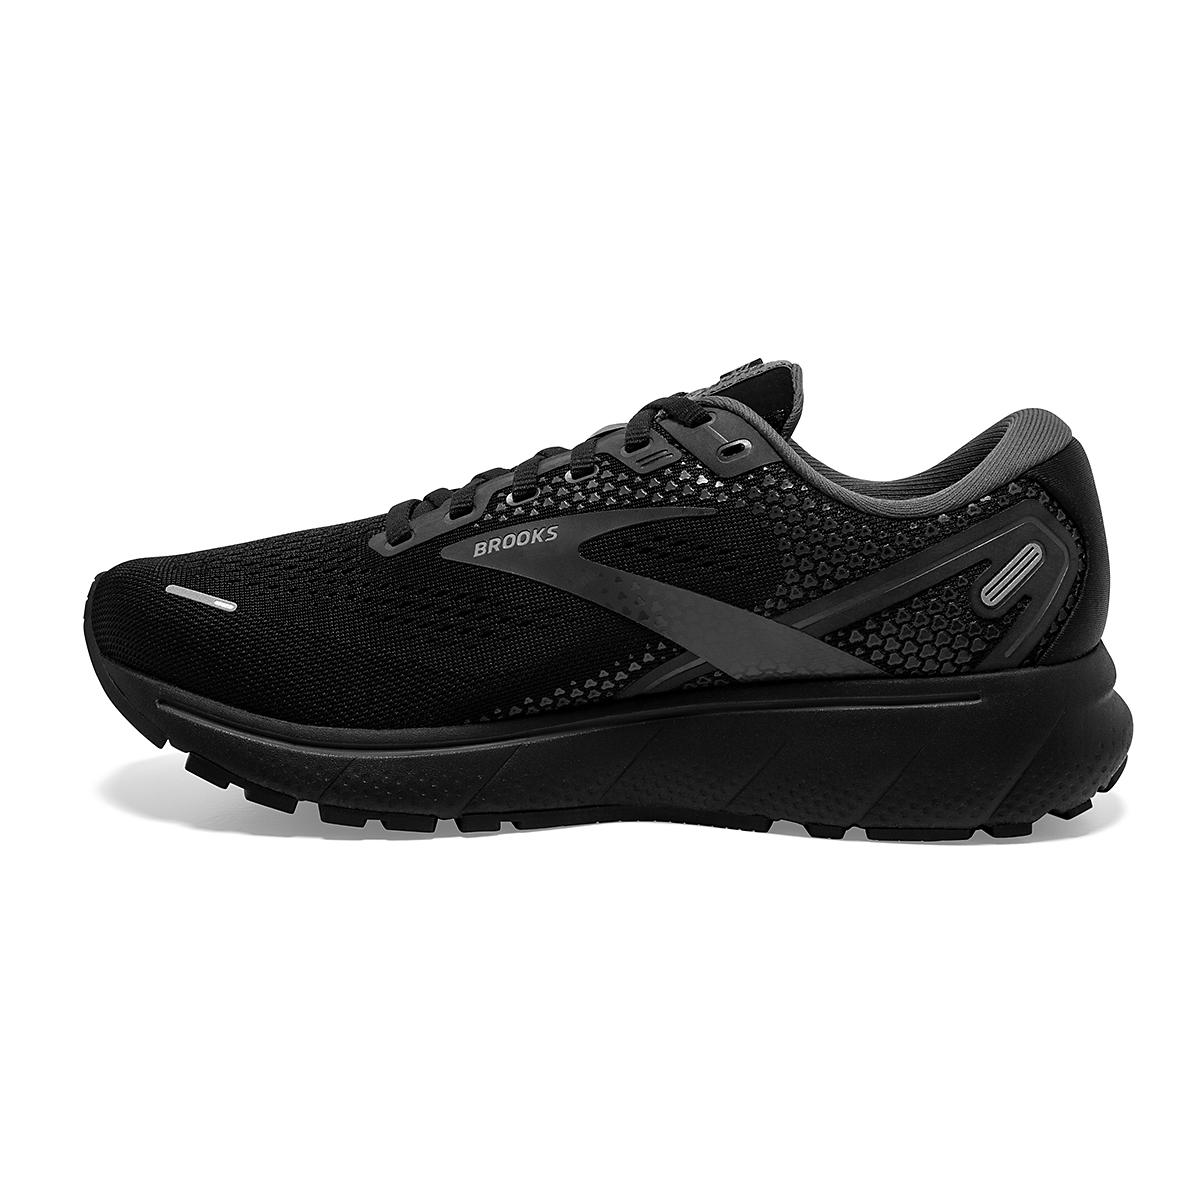 Women's Brooks Ghost 14 Running Shoe - Color: Black/Black/Ebony - Size: 5 - Width: Regular, Black/Black/Ebony, large, image 2